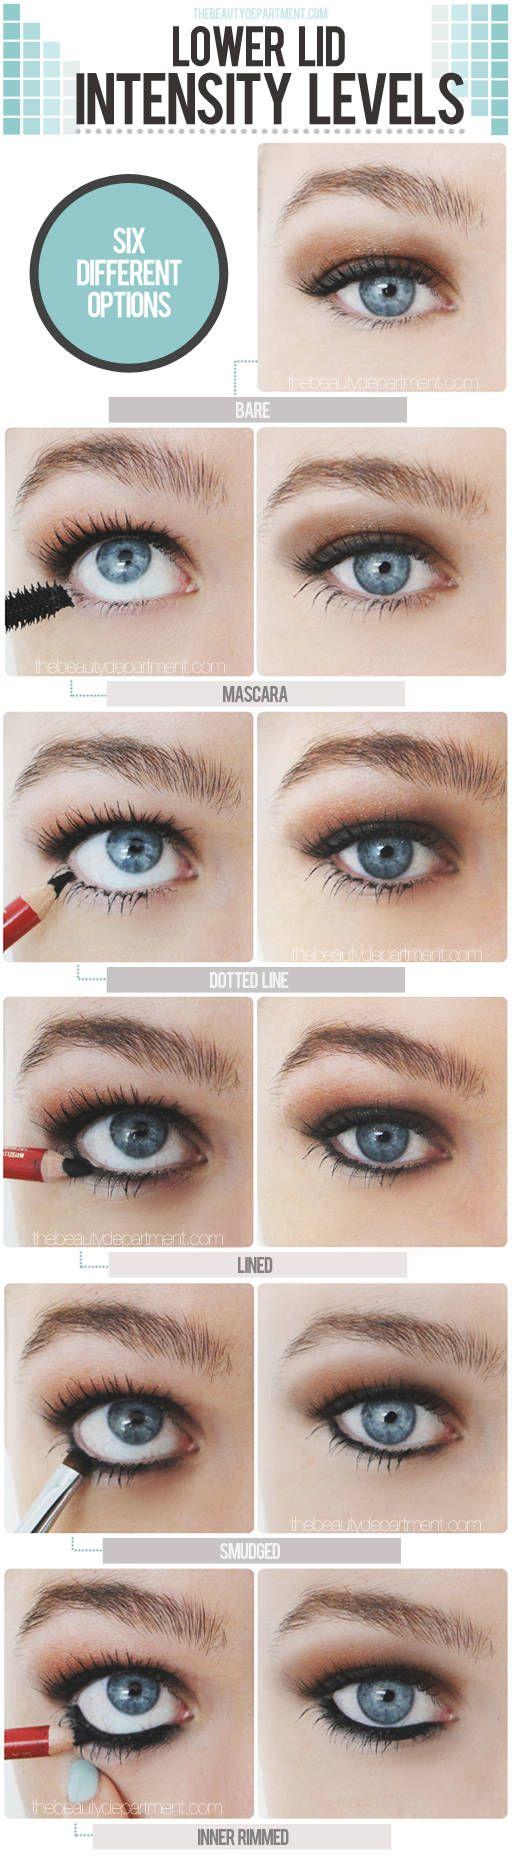 lower lid intensity levels #makeuptips #makeup